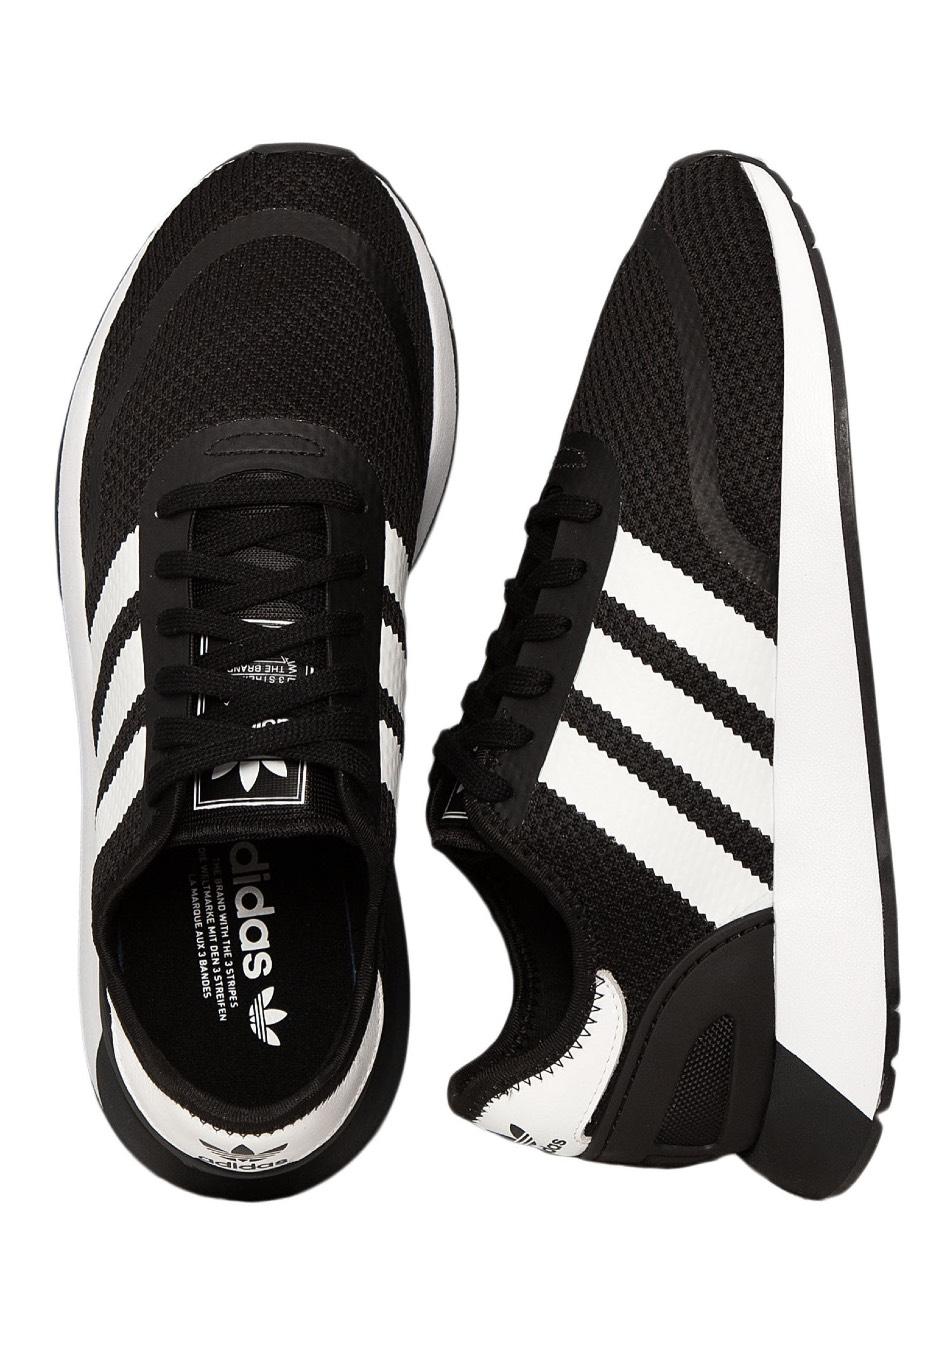 Adidas - N-5923 Core Black/Ftwr White/Core Black - Scarpe